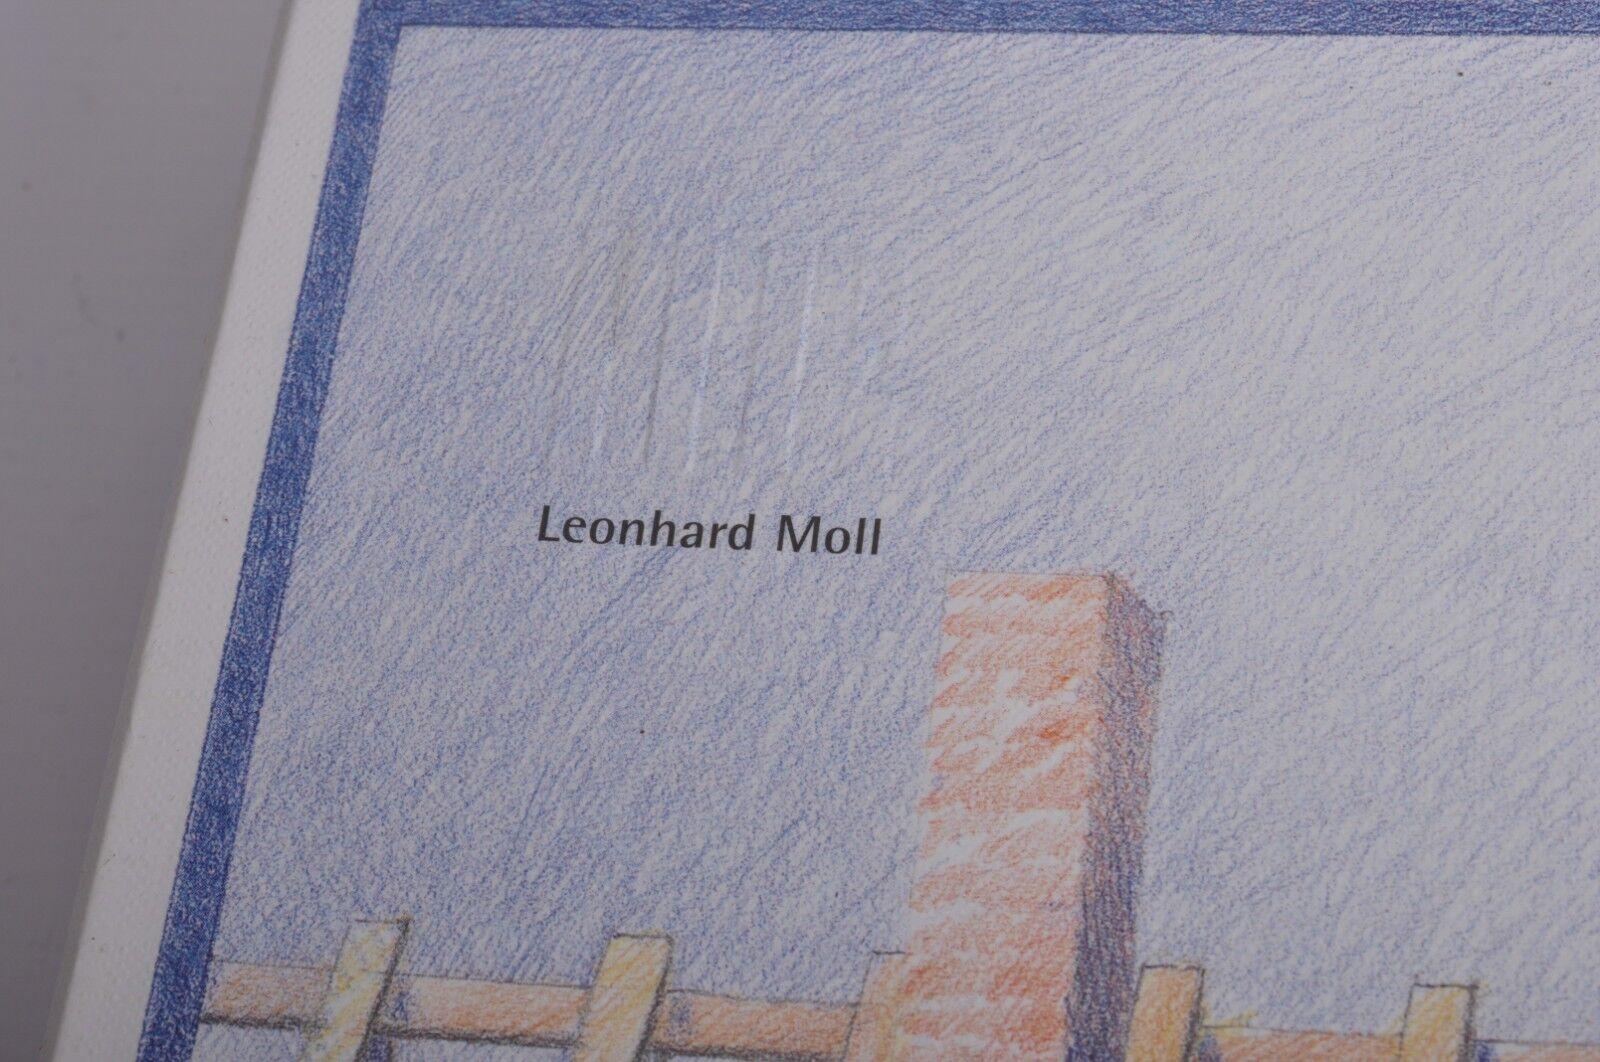 KEIMFARBEN GMBH   LEONHARD MOLL PROMOTIONAL BUILDING     CONSTRUCTION SET 1f7fde